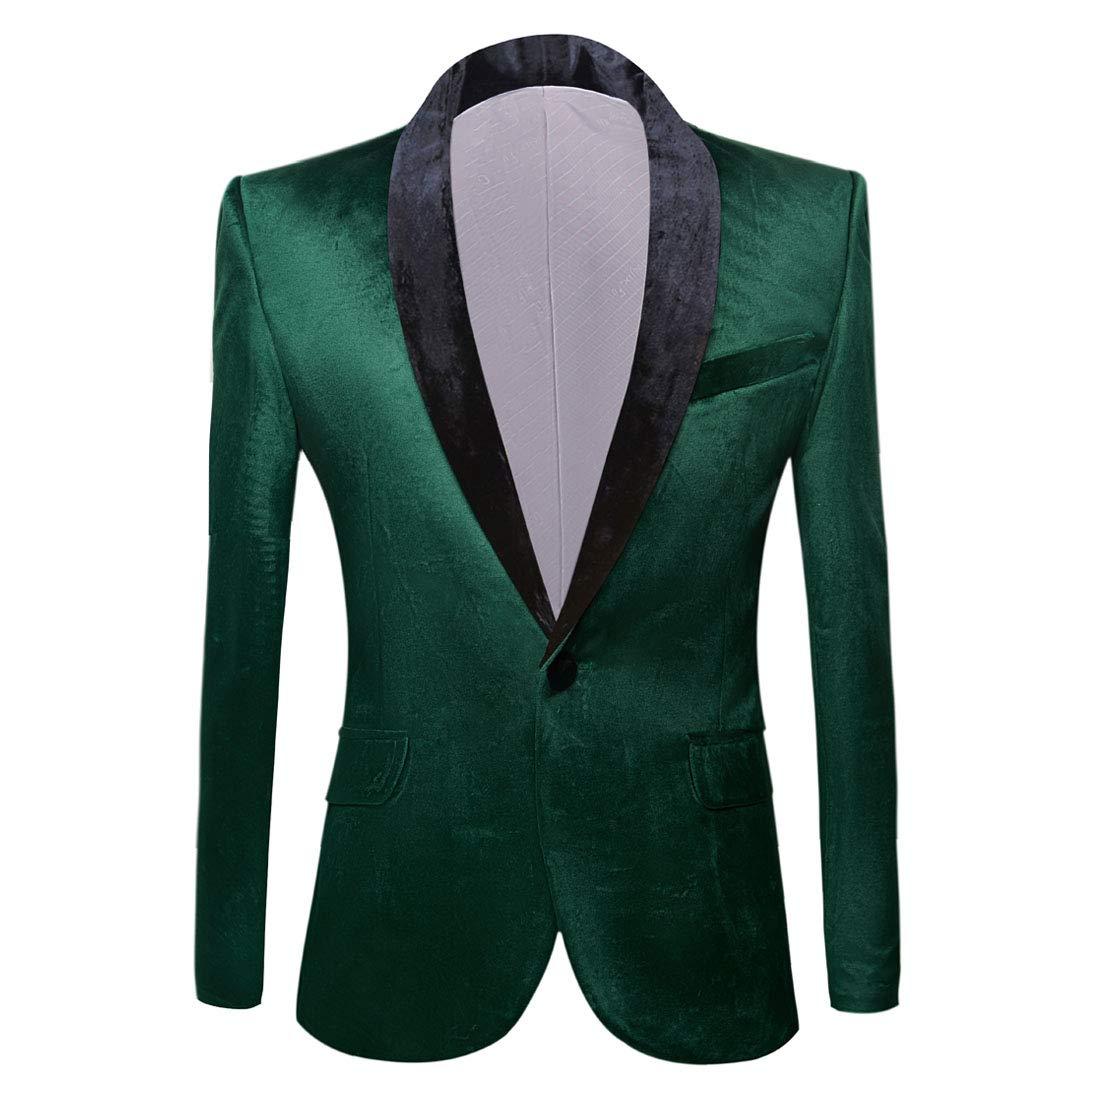 PYJTRL Mens Fashion Velvet Suit Jacket Slim Fit Blazers (Green, US 38R) by PYJTRL